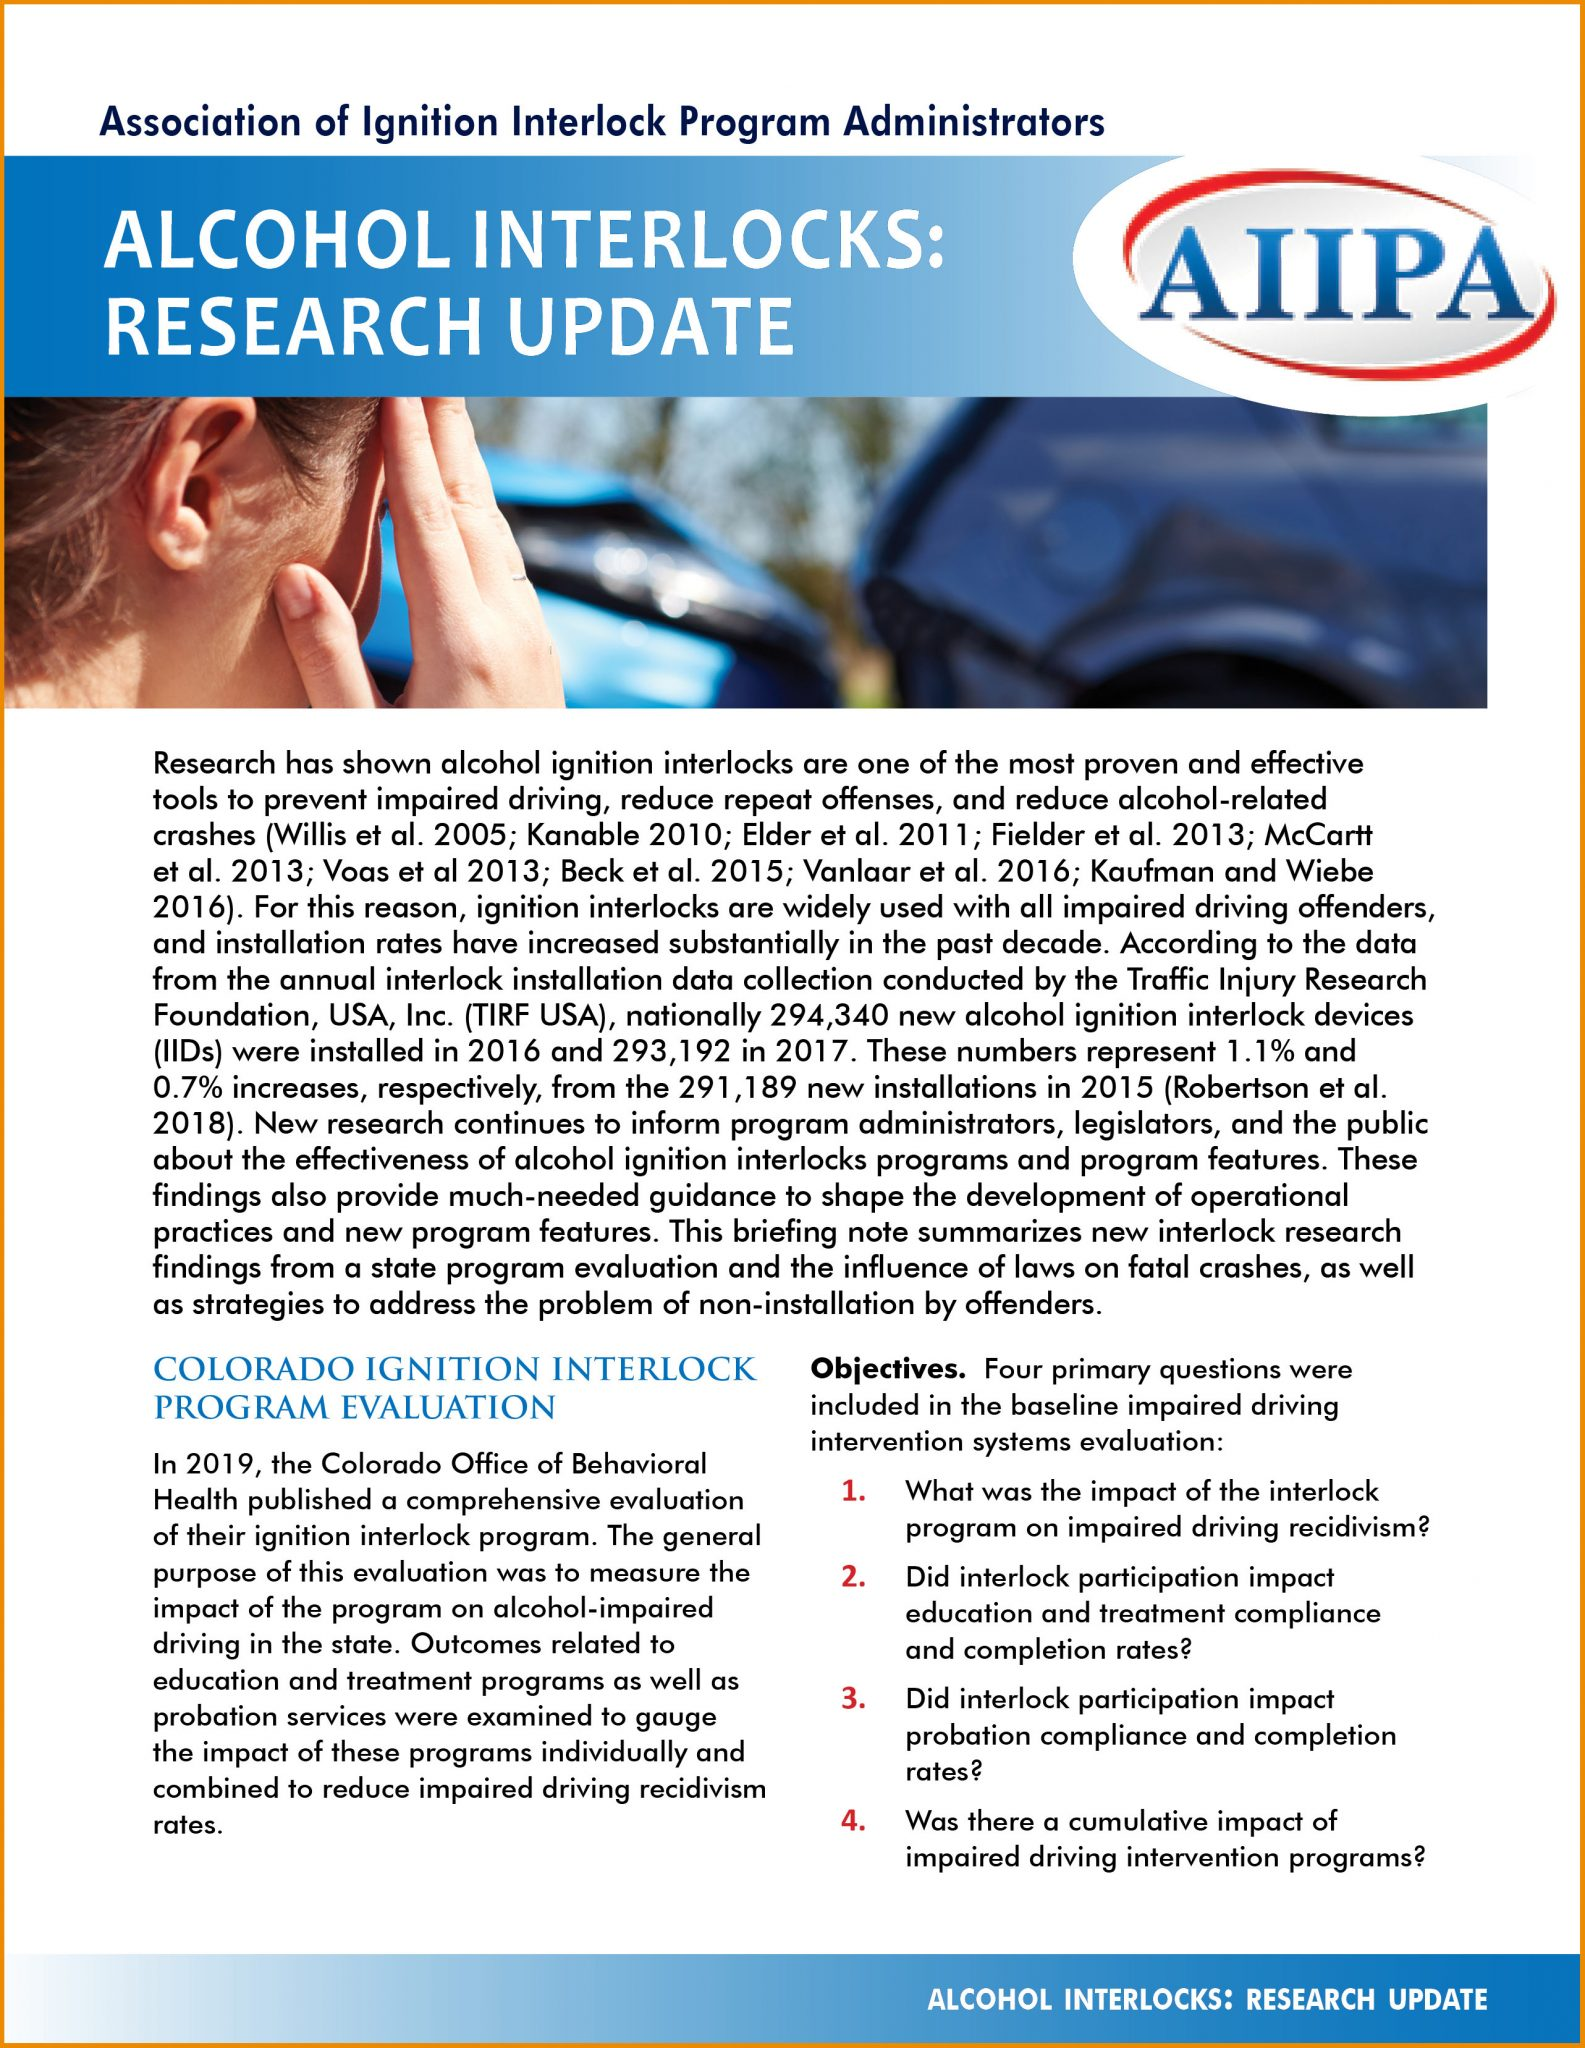 Alcohol Interlocks: Research Update